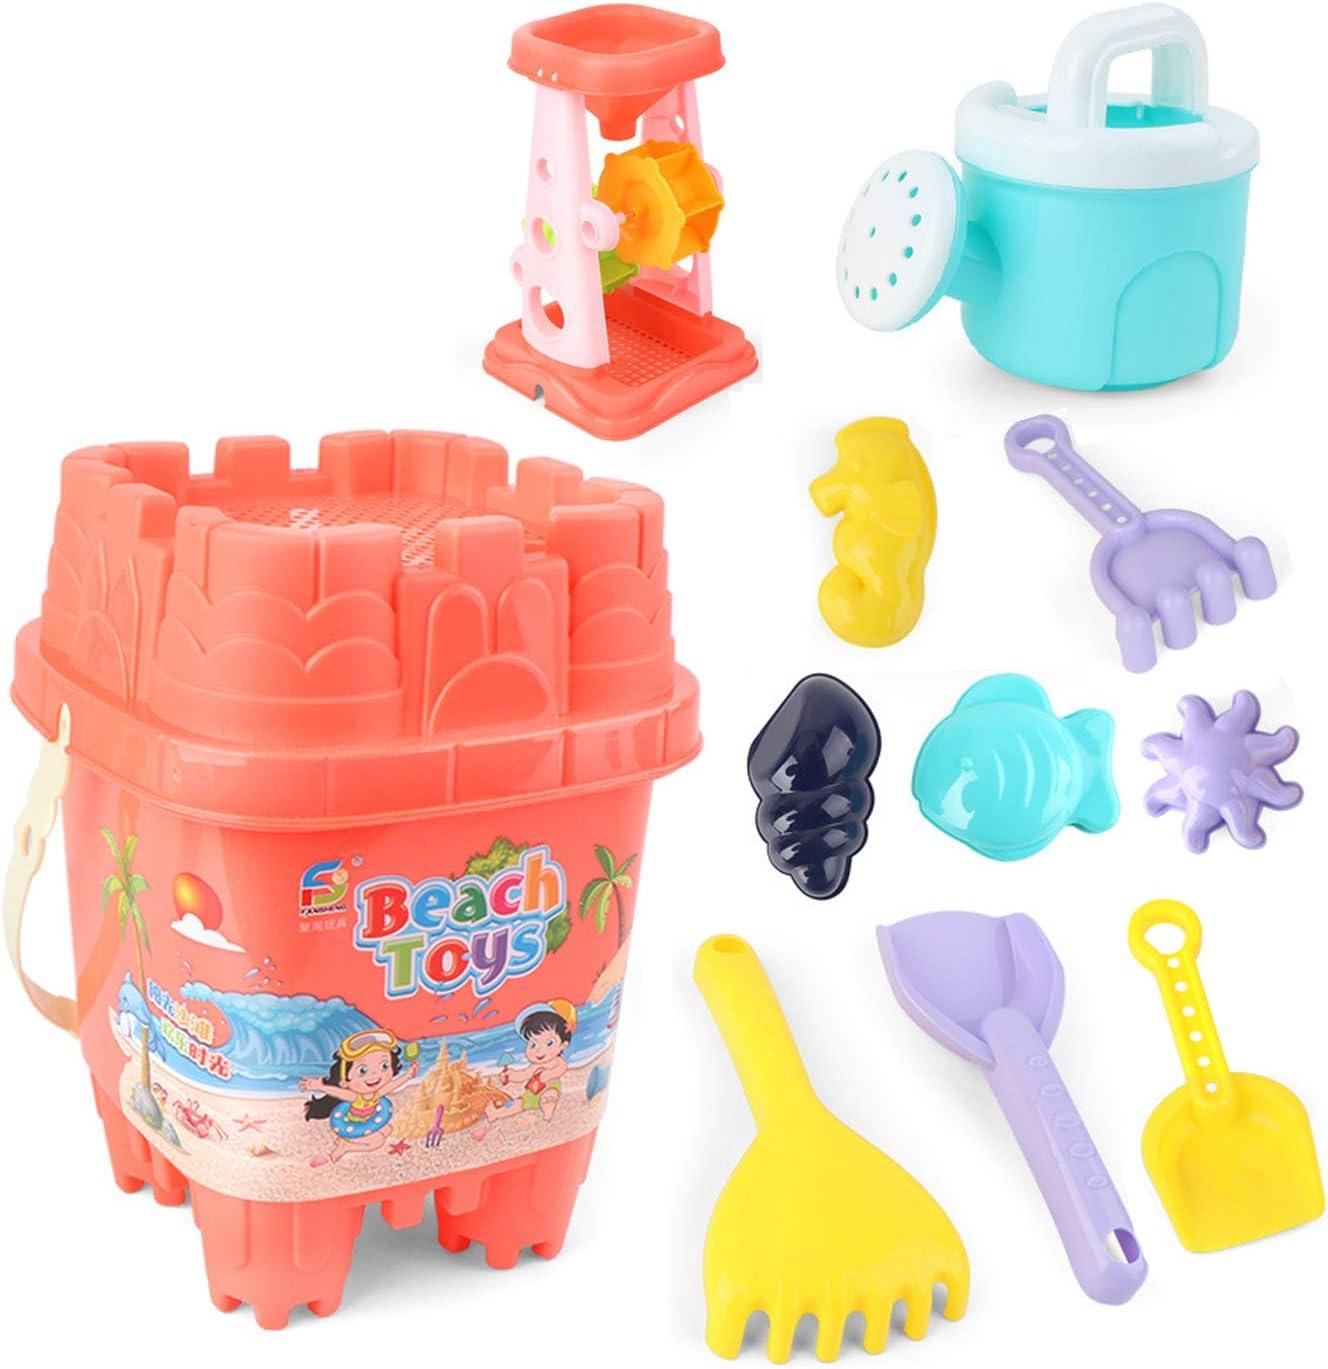 KELEQI Kids Beach New Free Shipping Sand National uniform free shipping Box Water Sandpit 11 Toy pcs Crane T